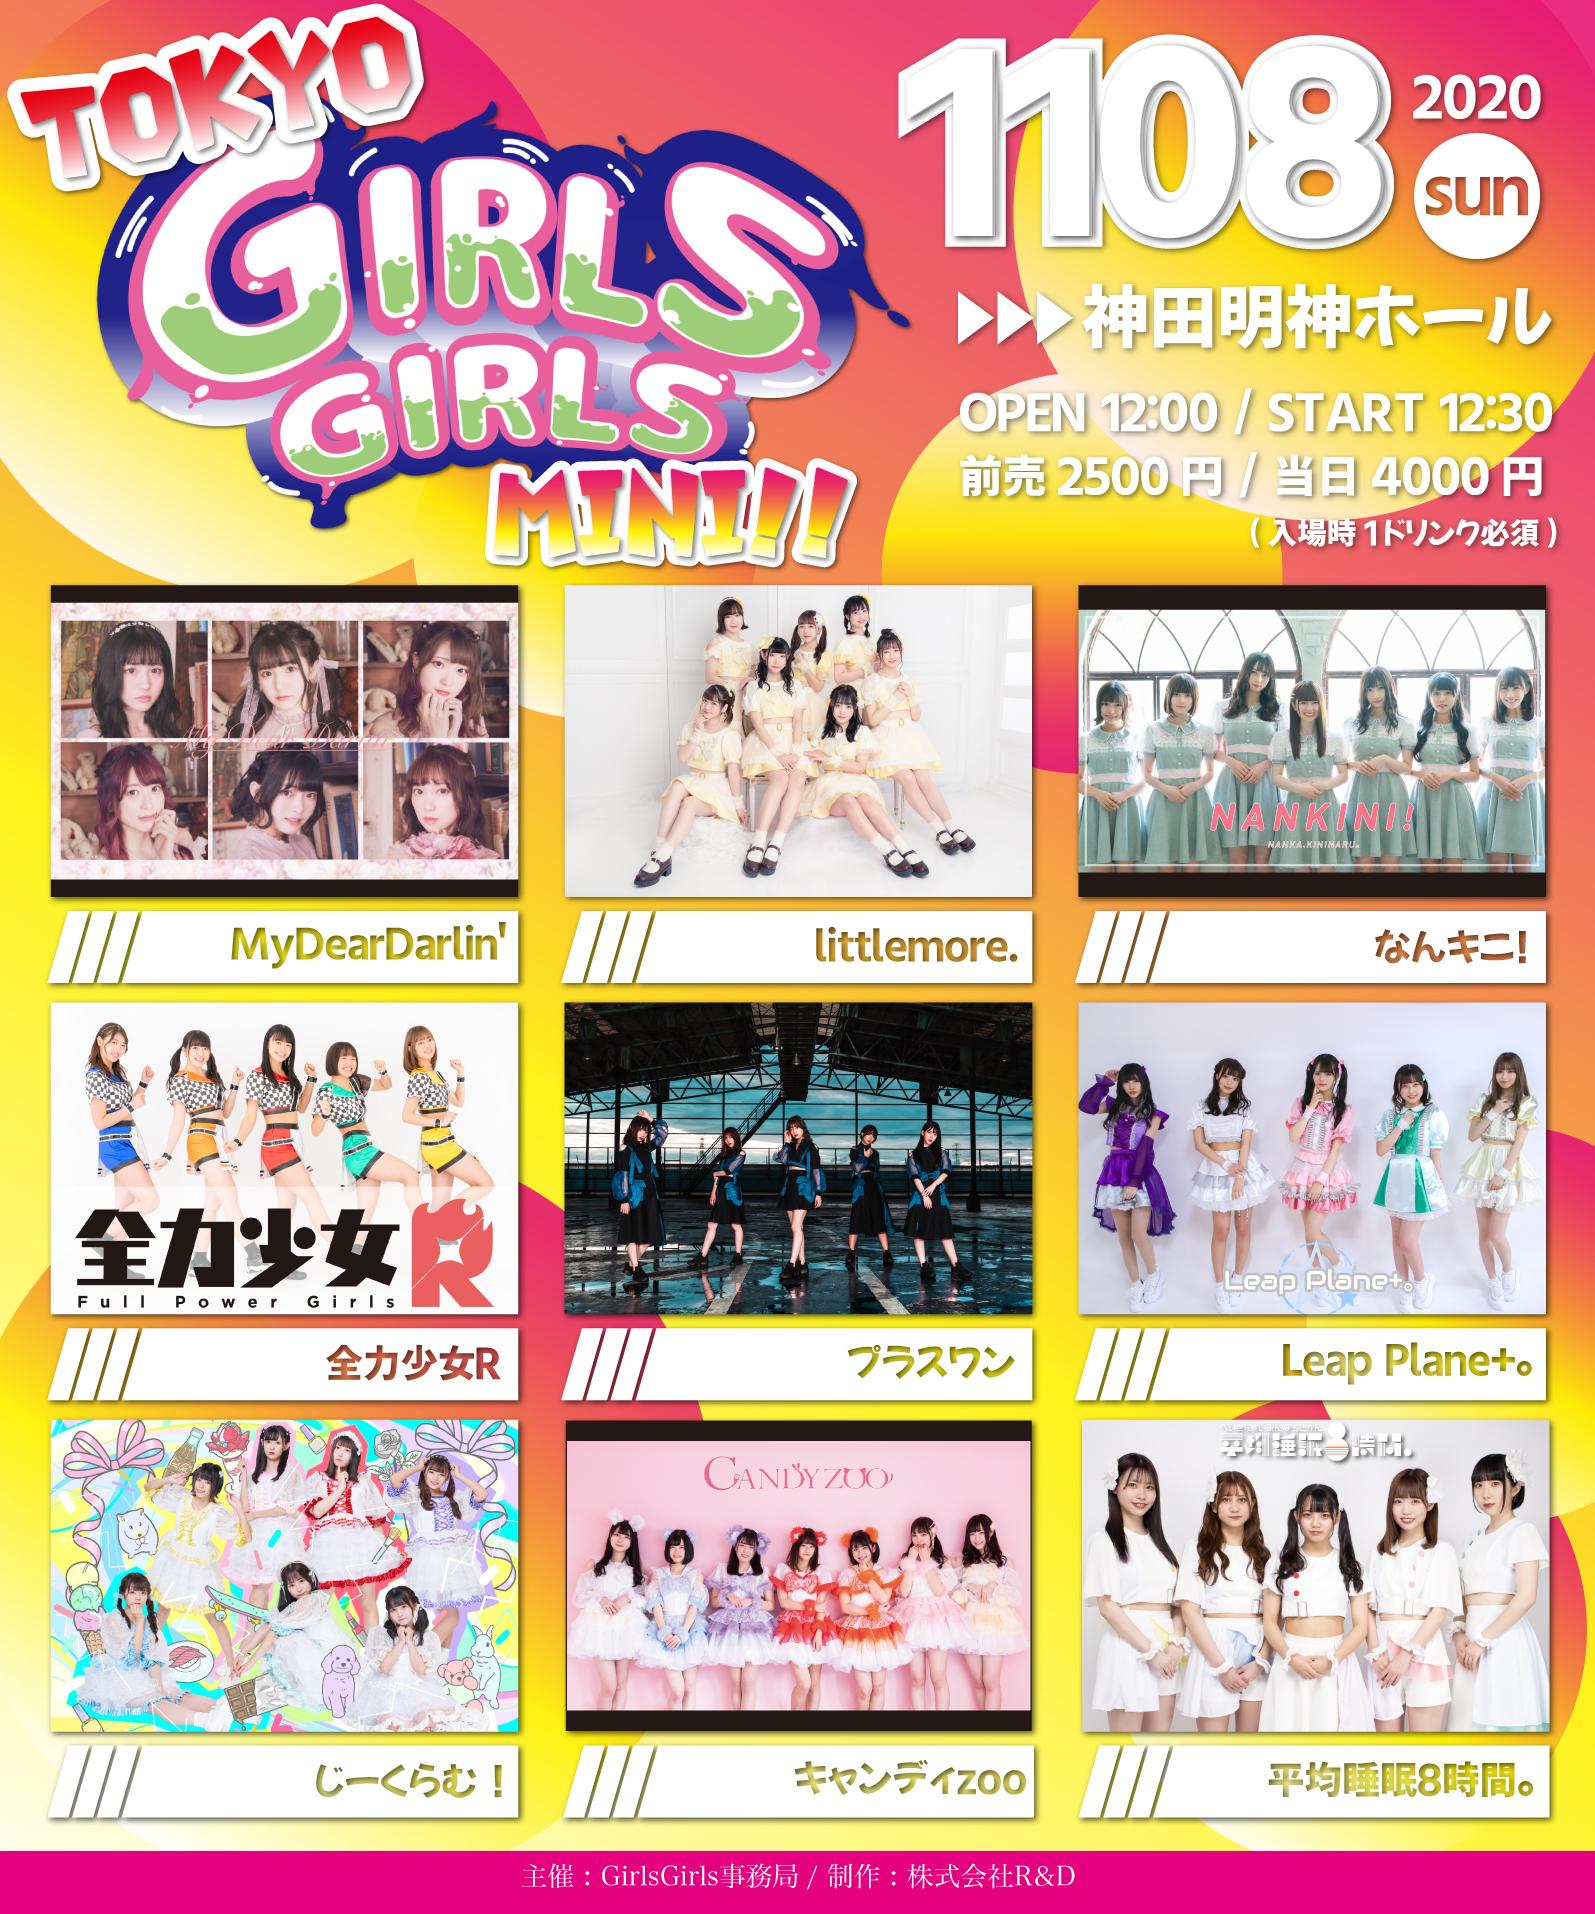 11/8(日) TOKYO GIRLS GIRLS mini!!